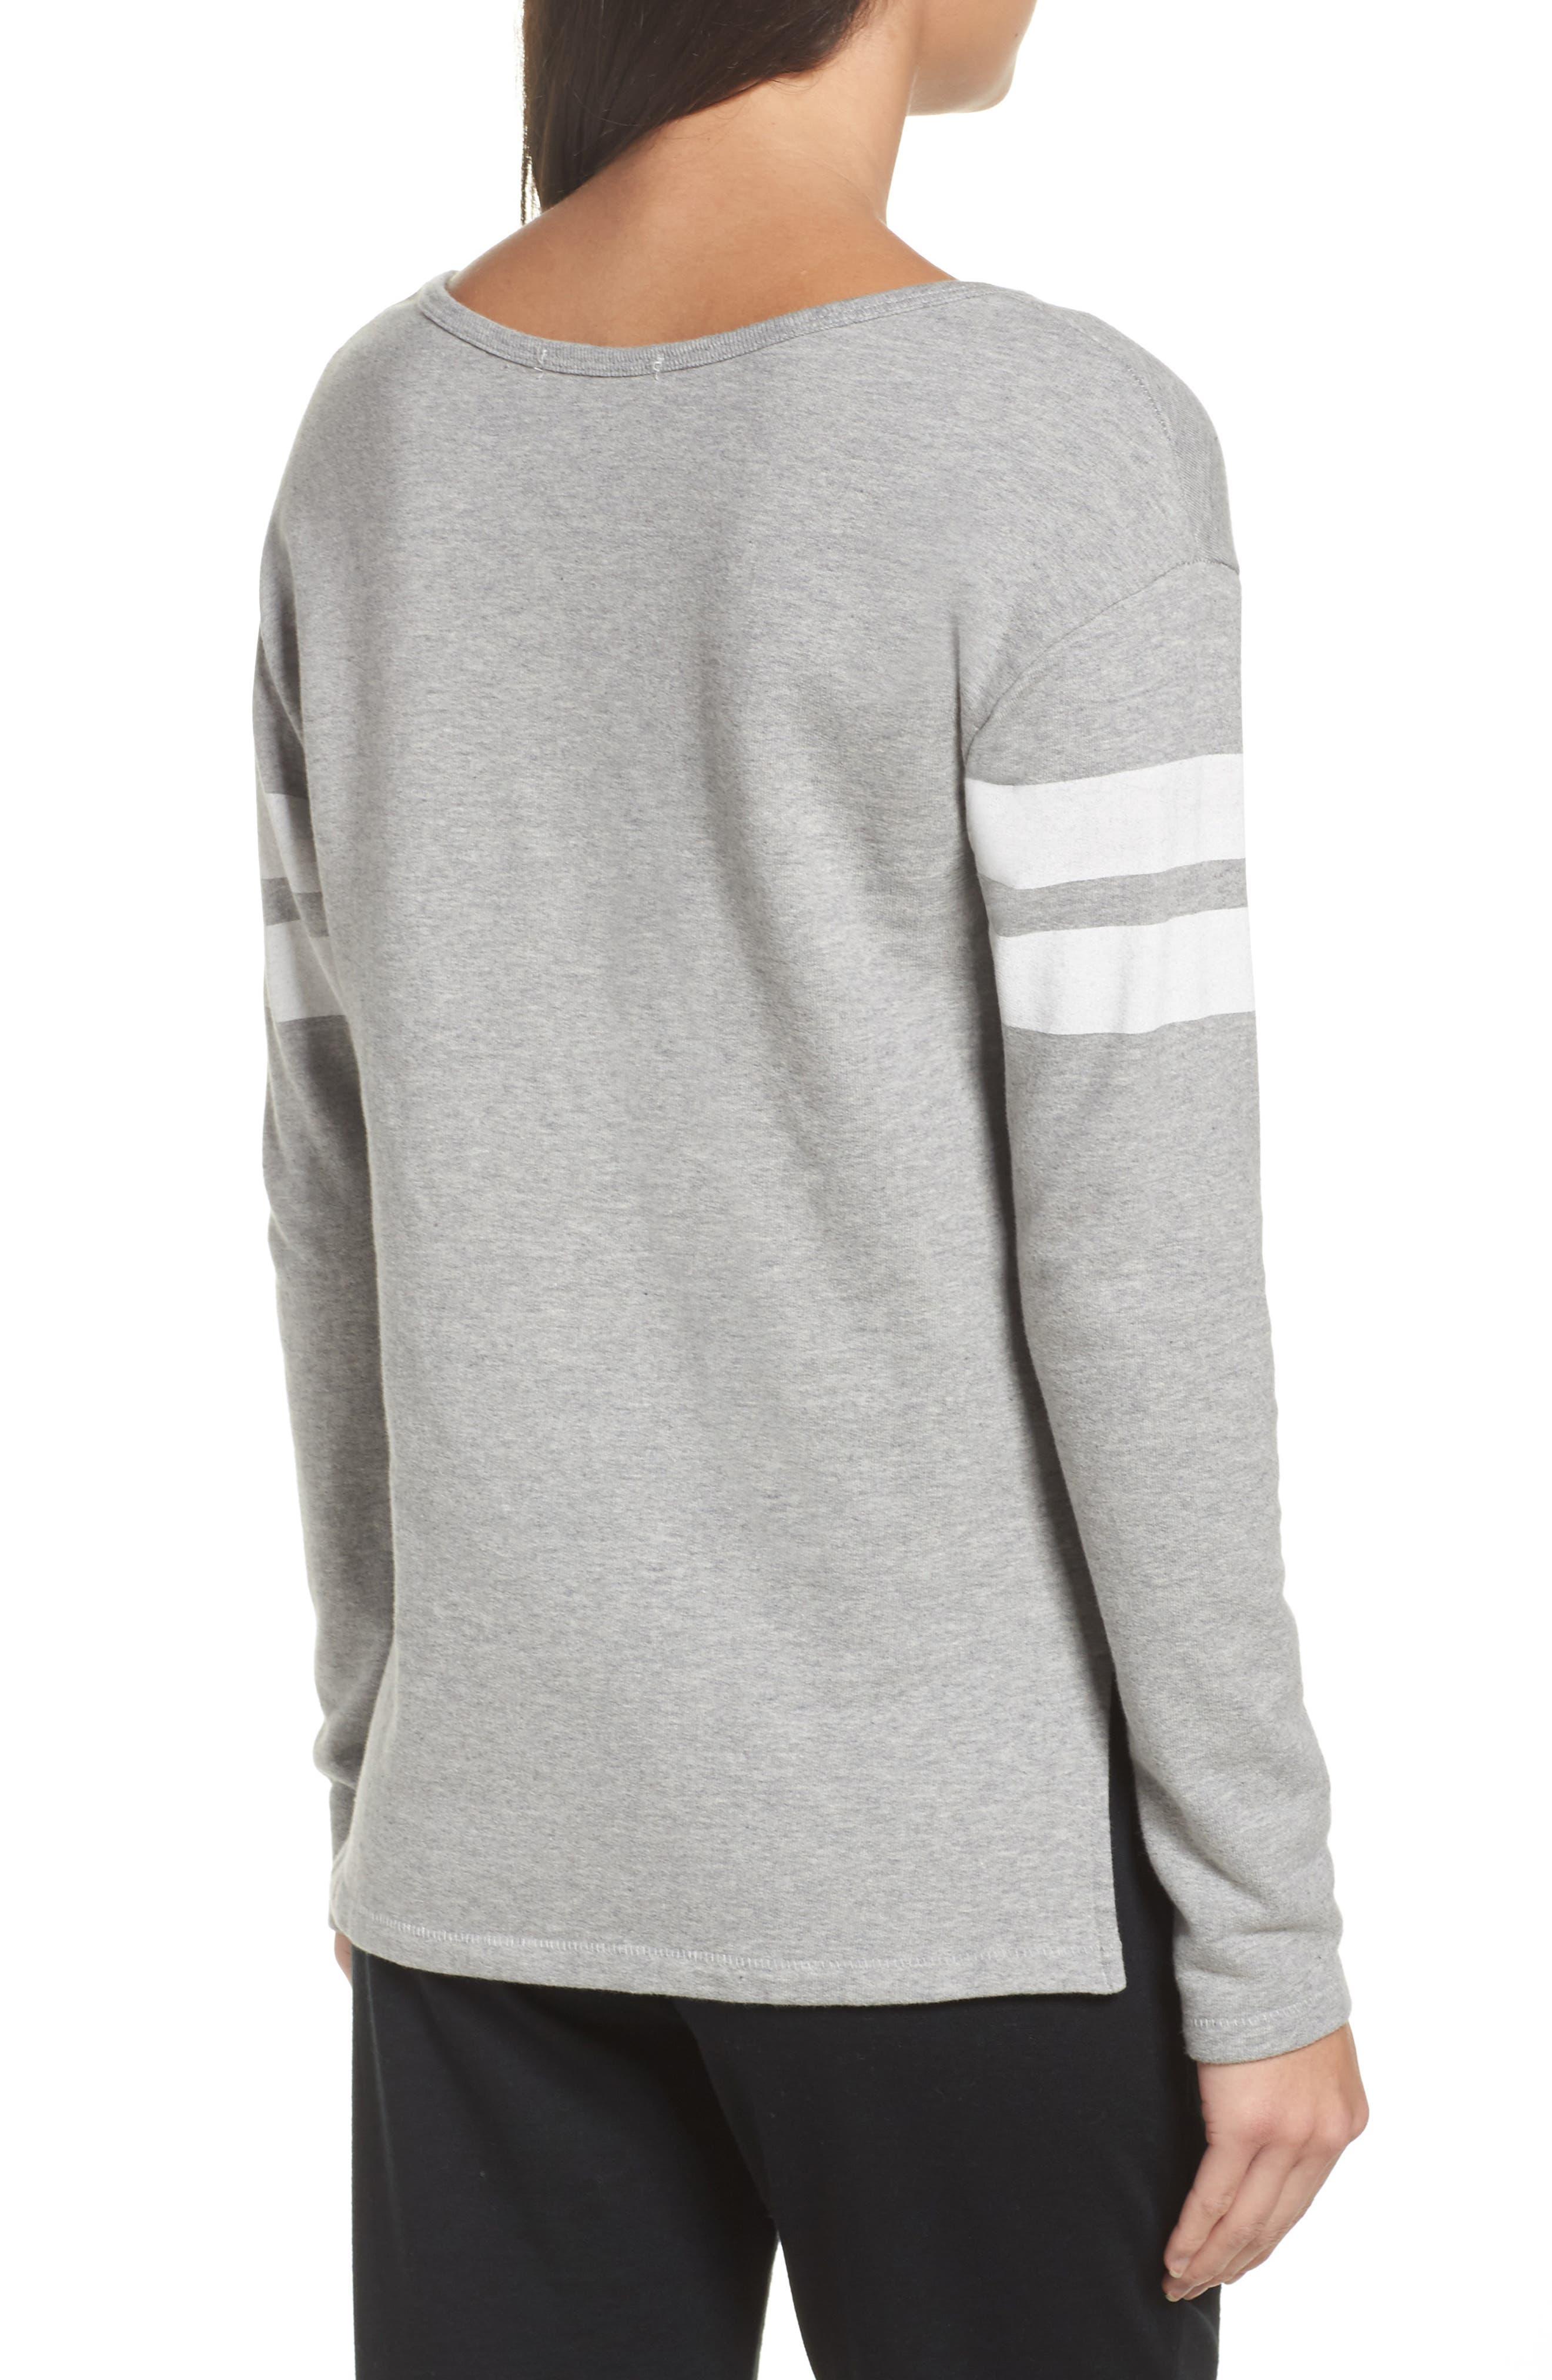 Alternate Image 2  - Junk Food NFL New England Patriots Champion Sweatshirt